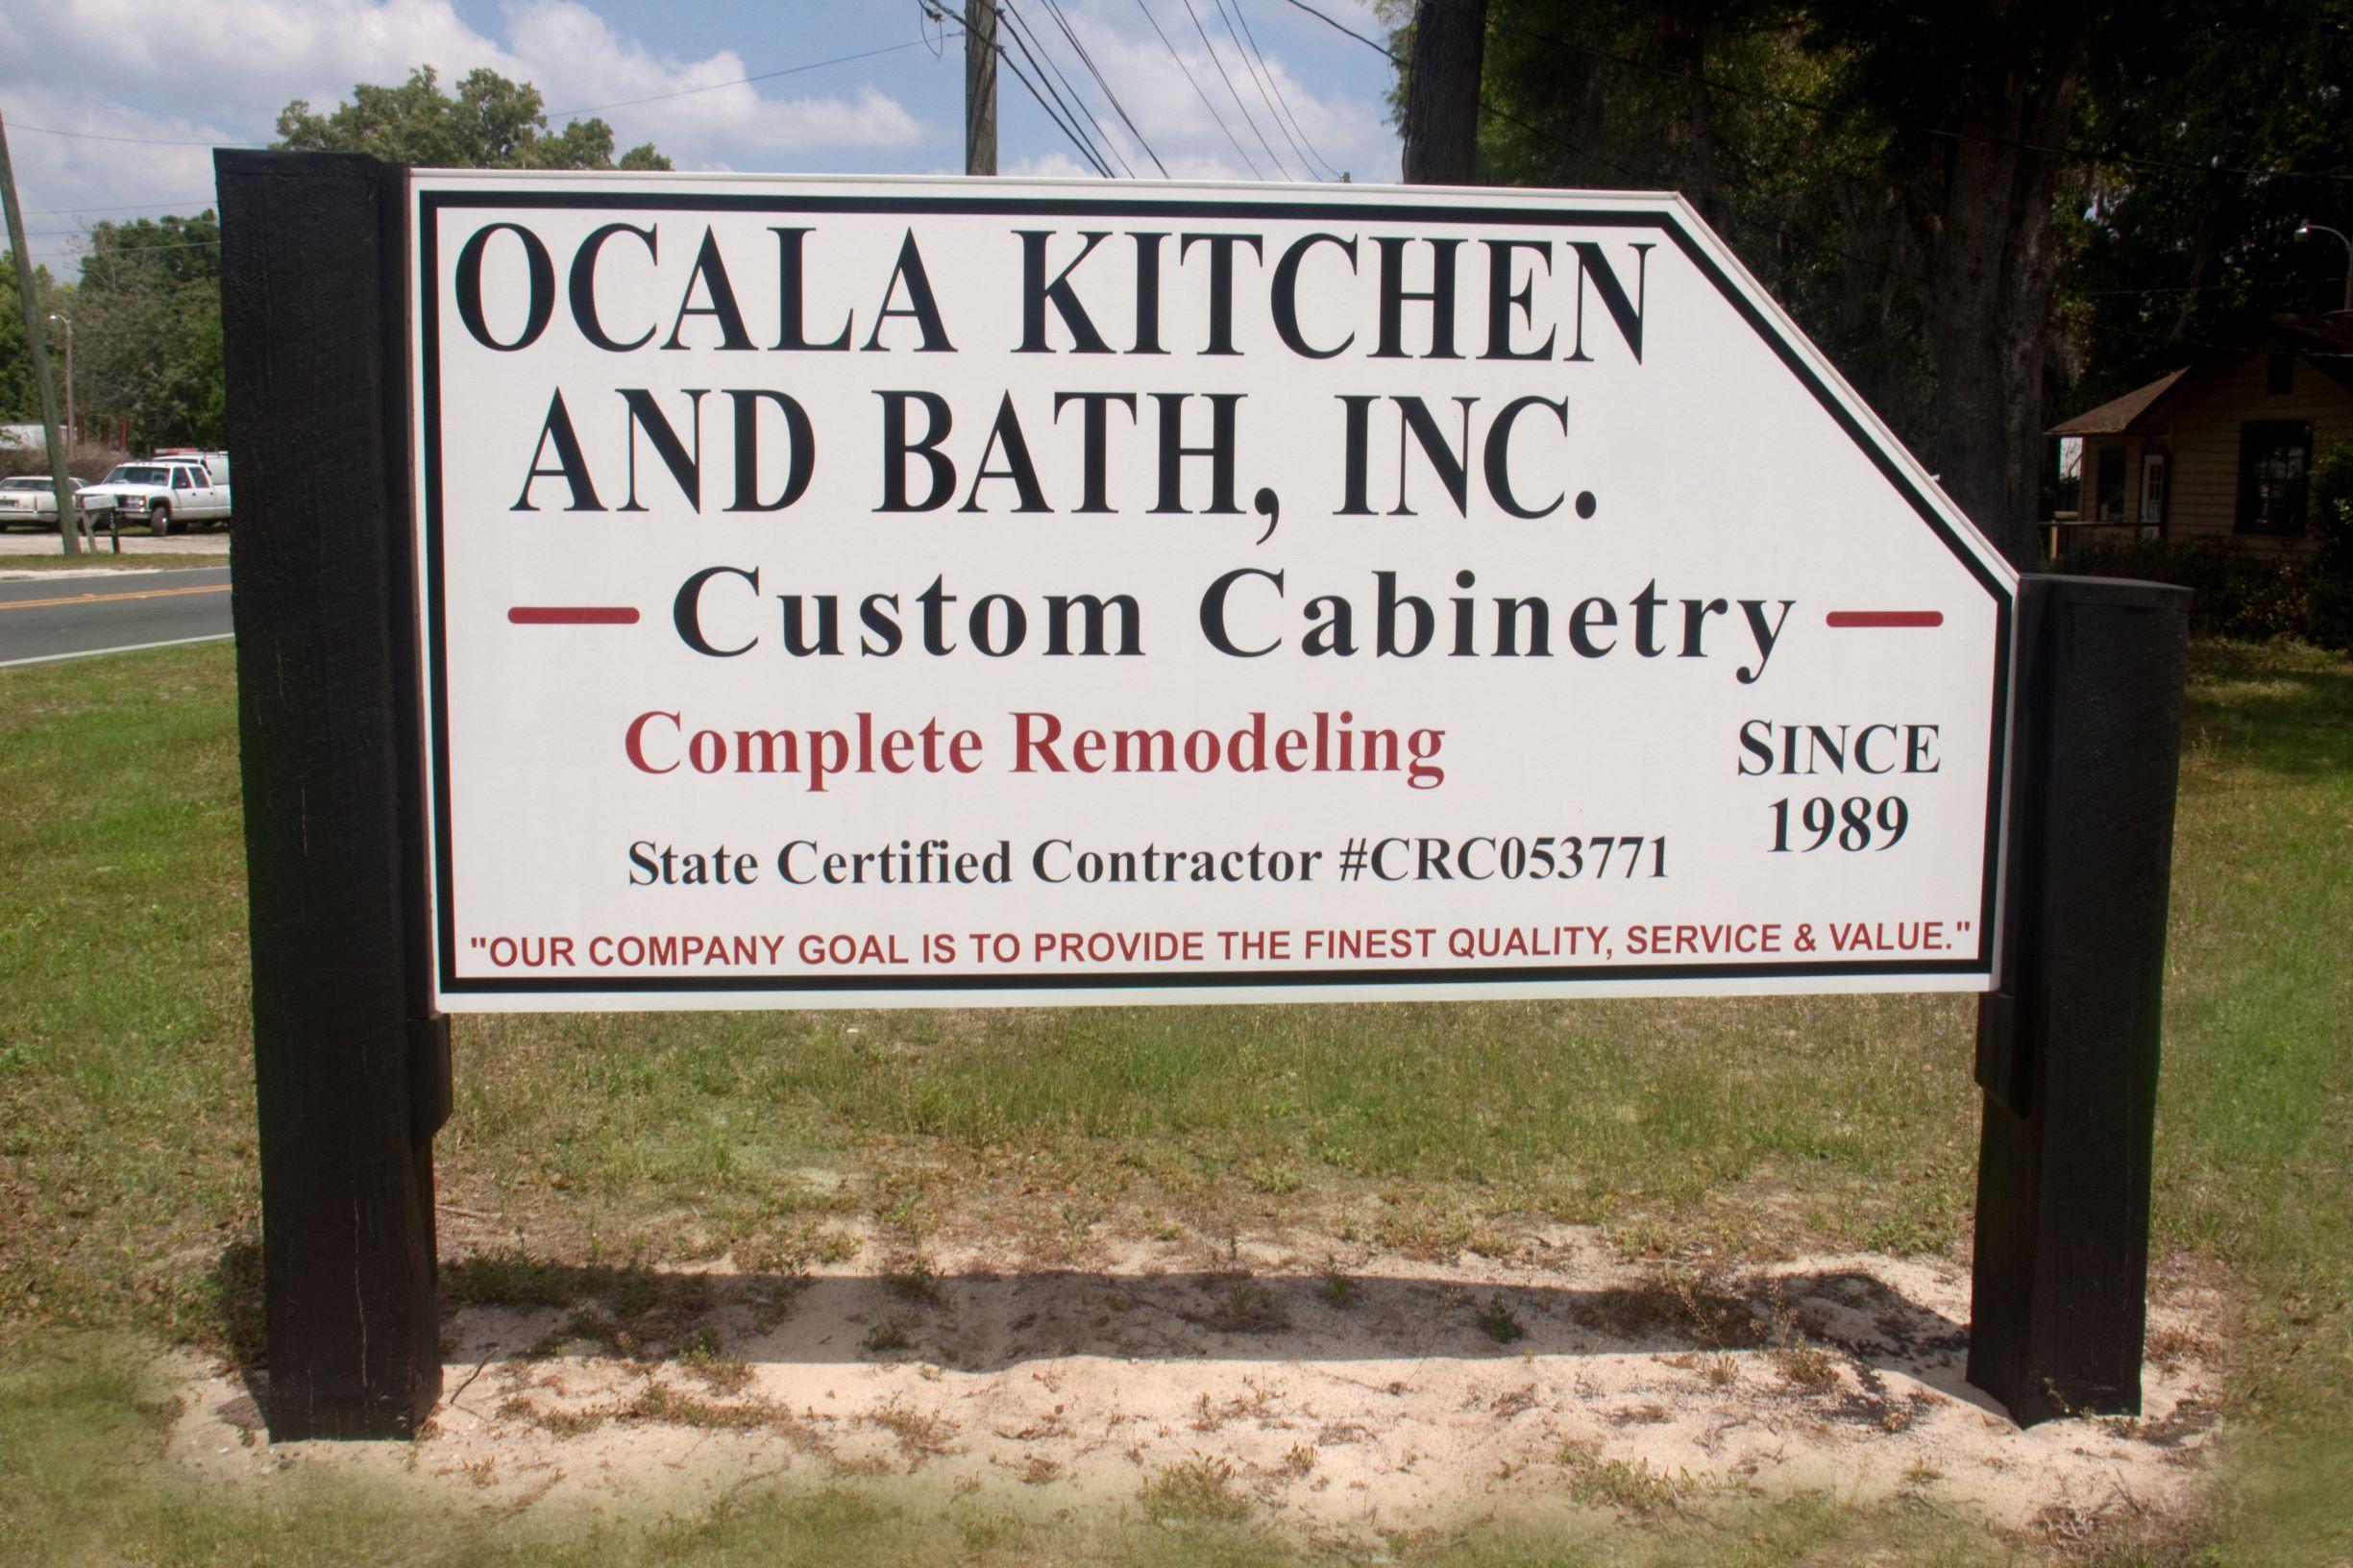 Ocala Kitchen And Bath Inc.